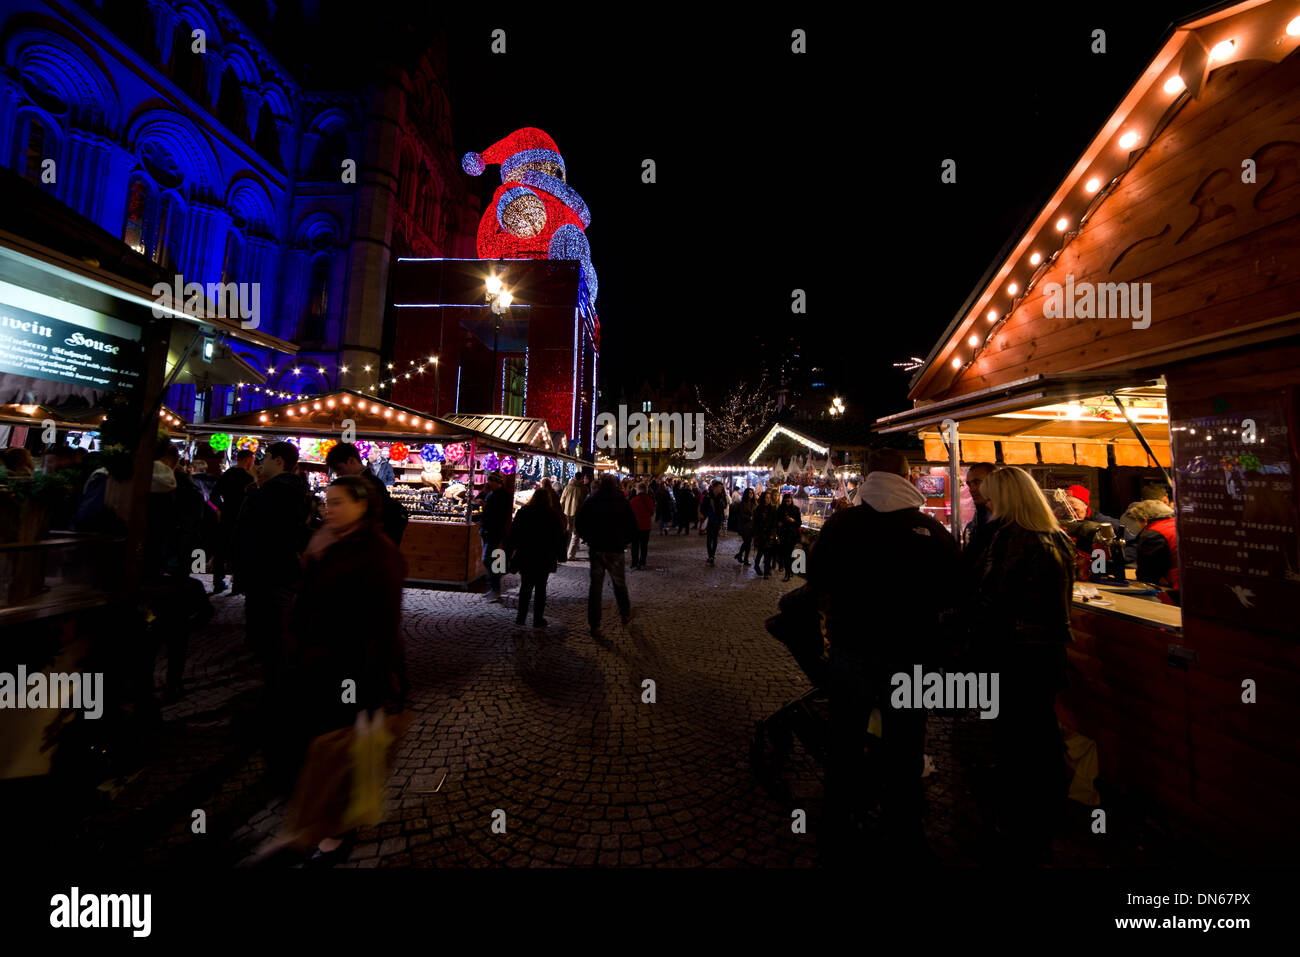 Manchester, Christmas, market, stall, 2013, night, European, German, Italian, winter, December, England, EU, commerce, business, - Stock Image